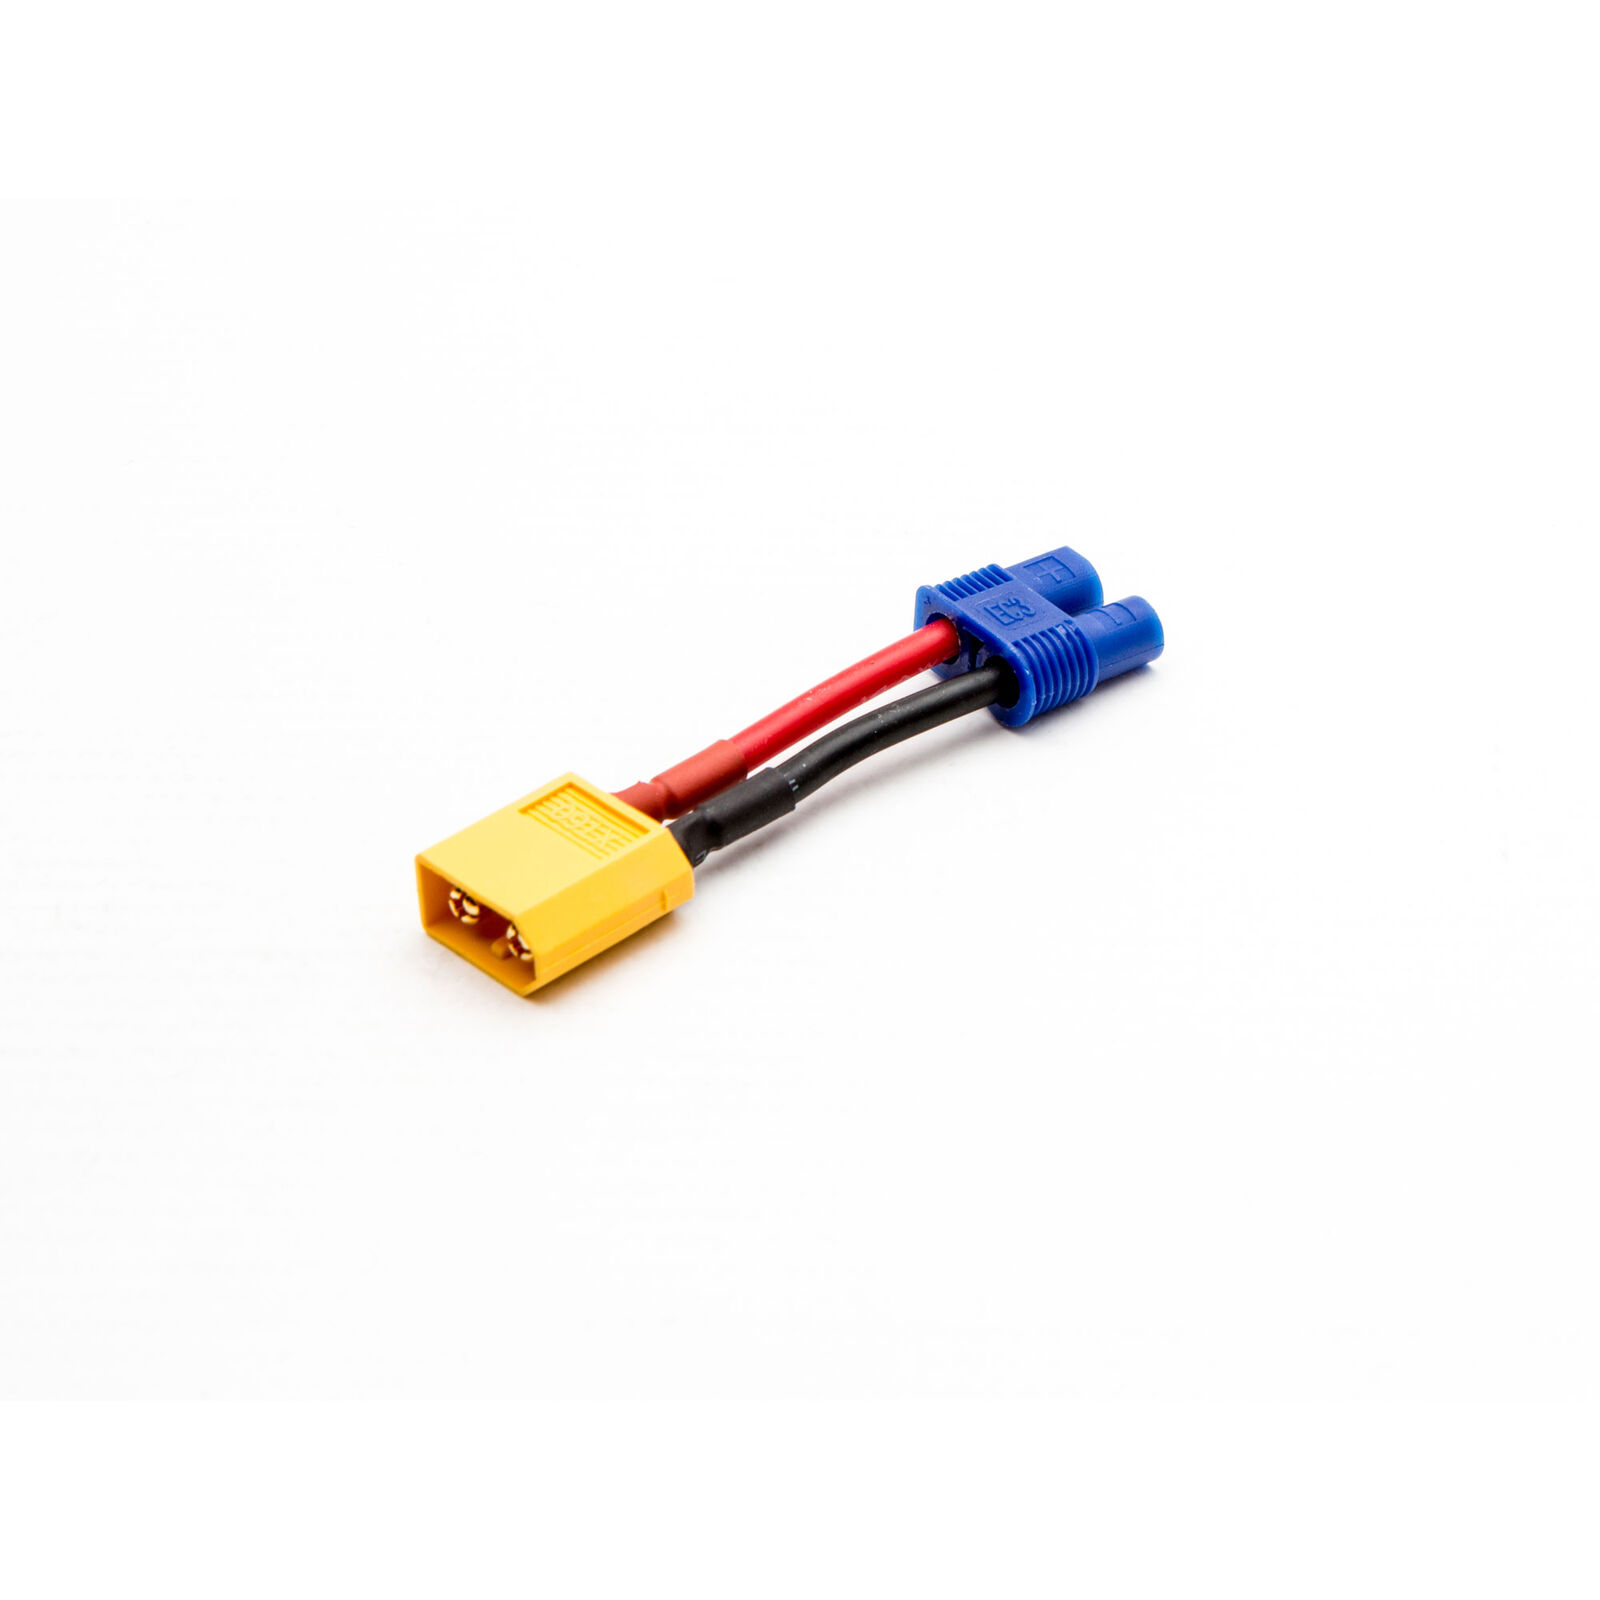 Adapter: XT60 Device / EC3 Battery